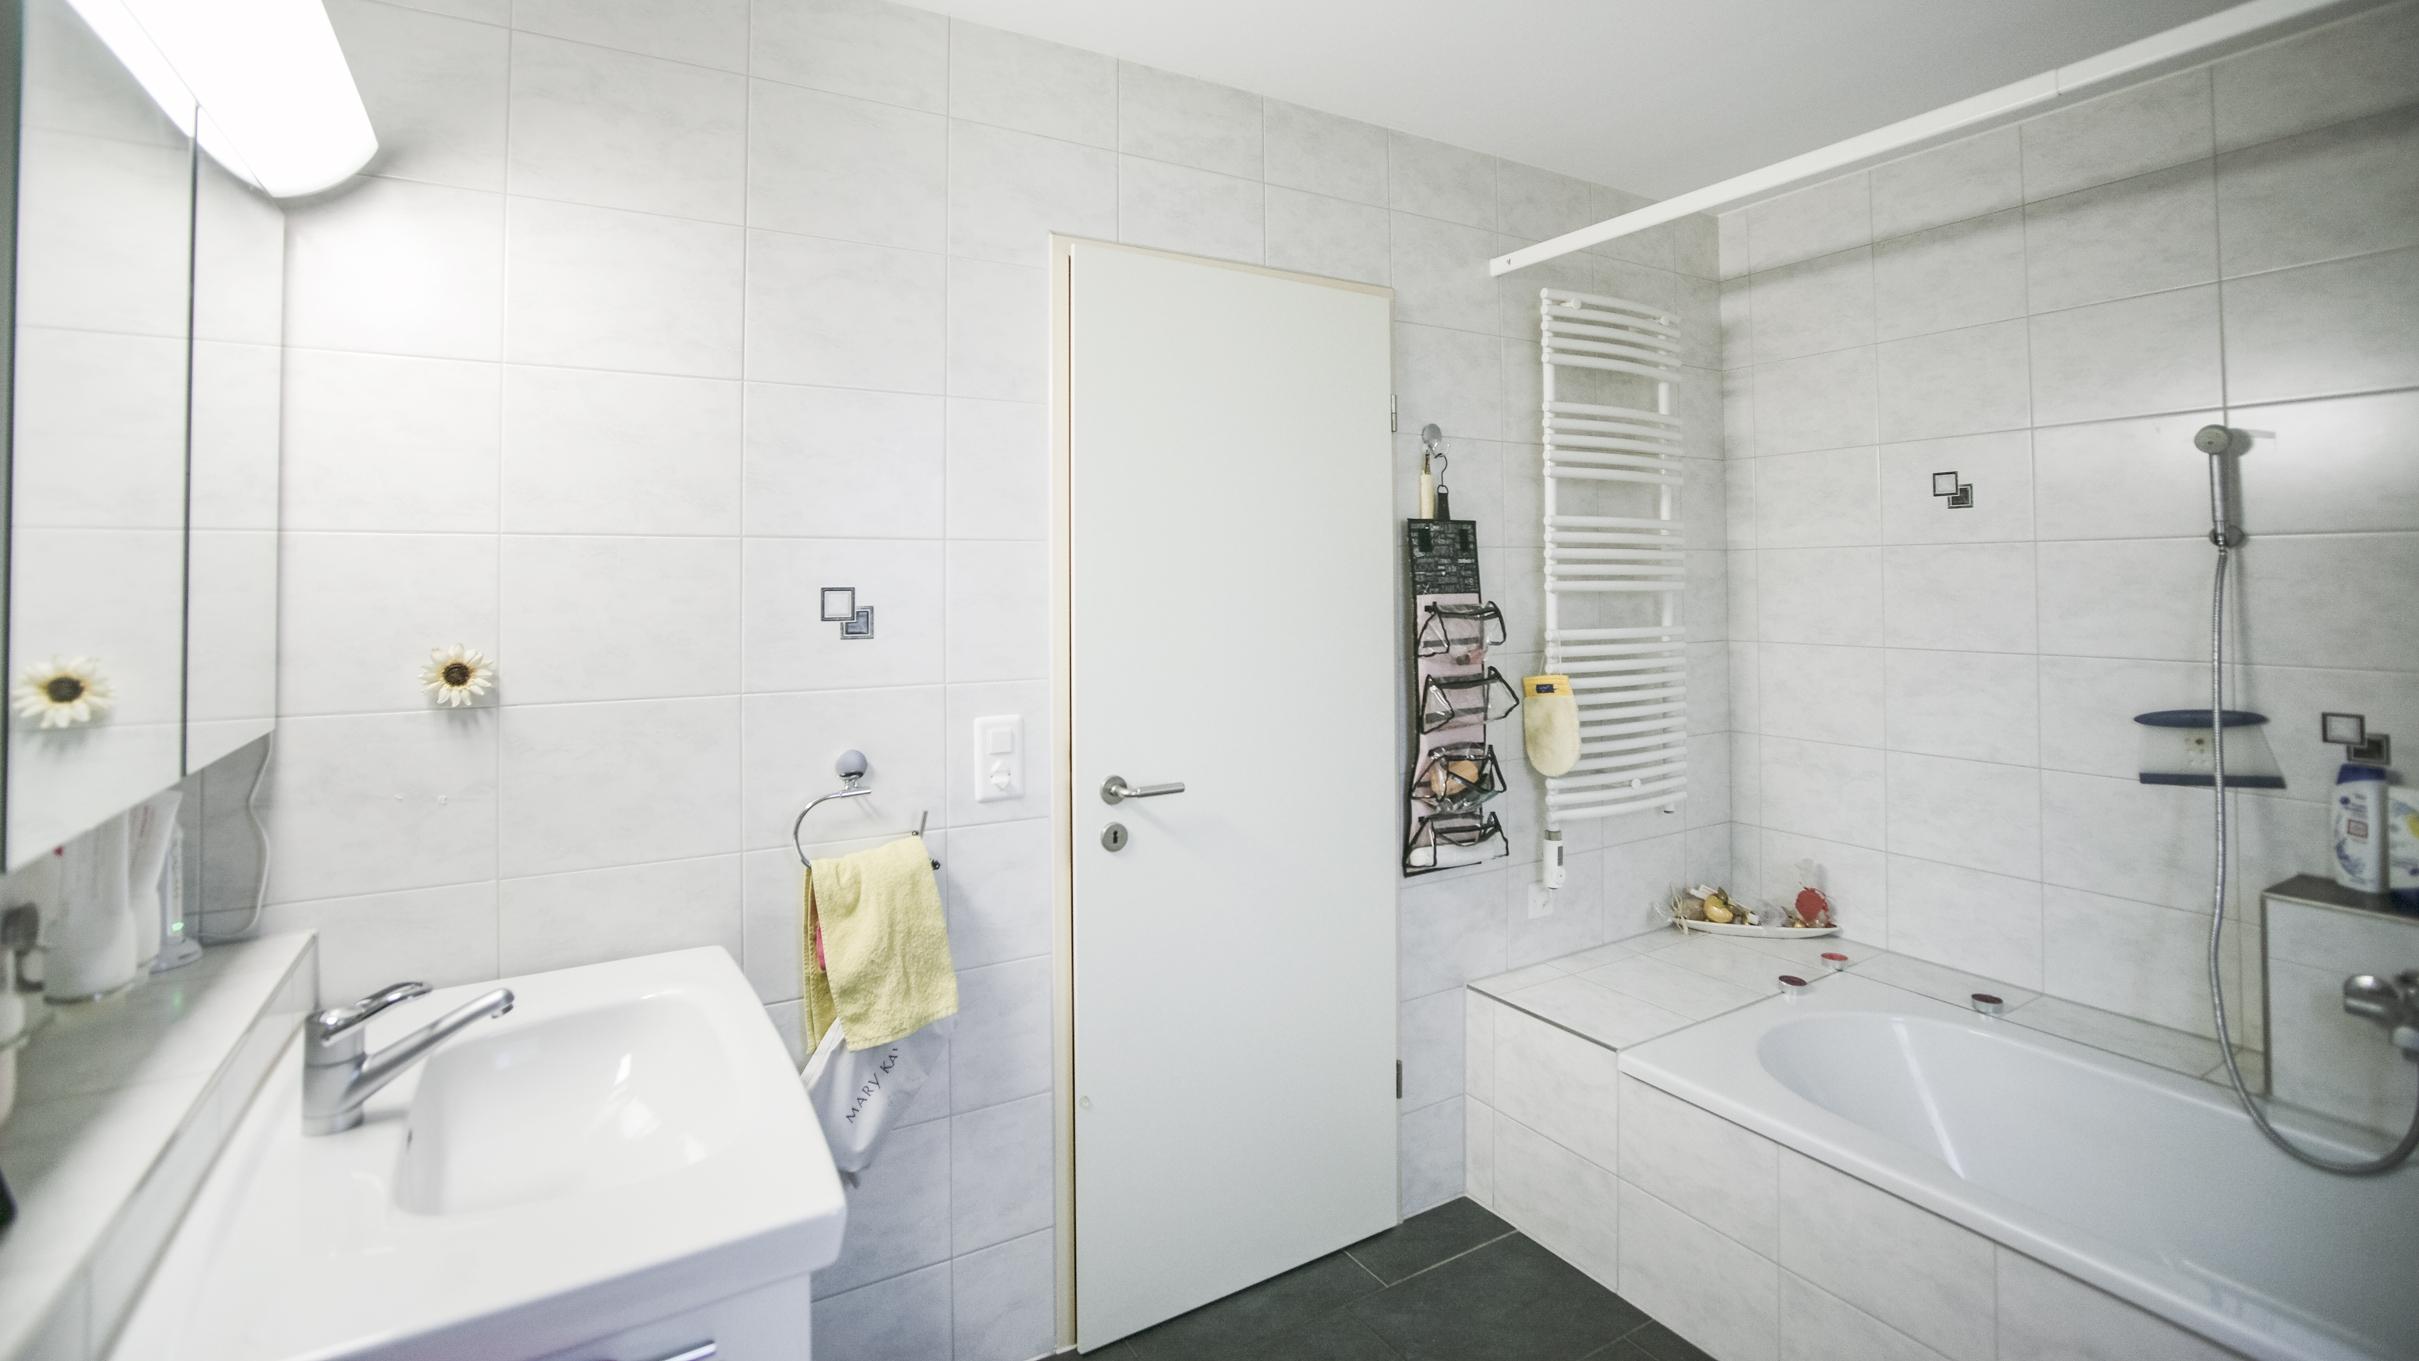 Boll_Immobilien_Haus_3.jpg